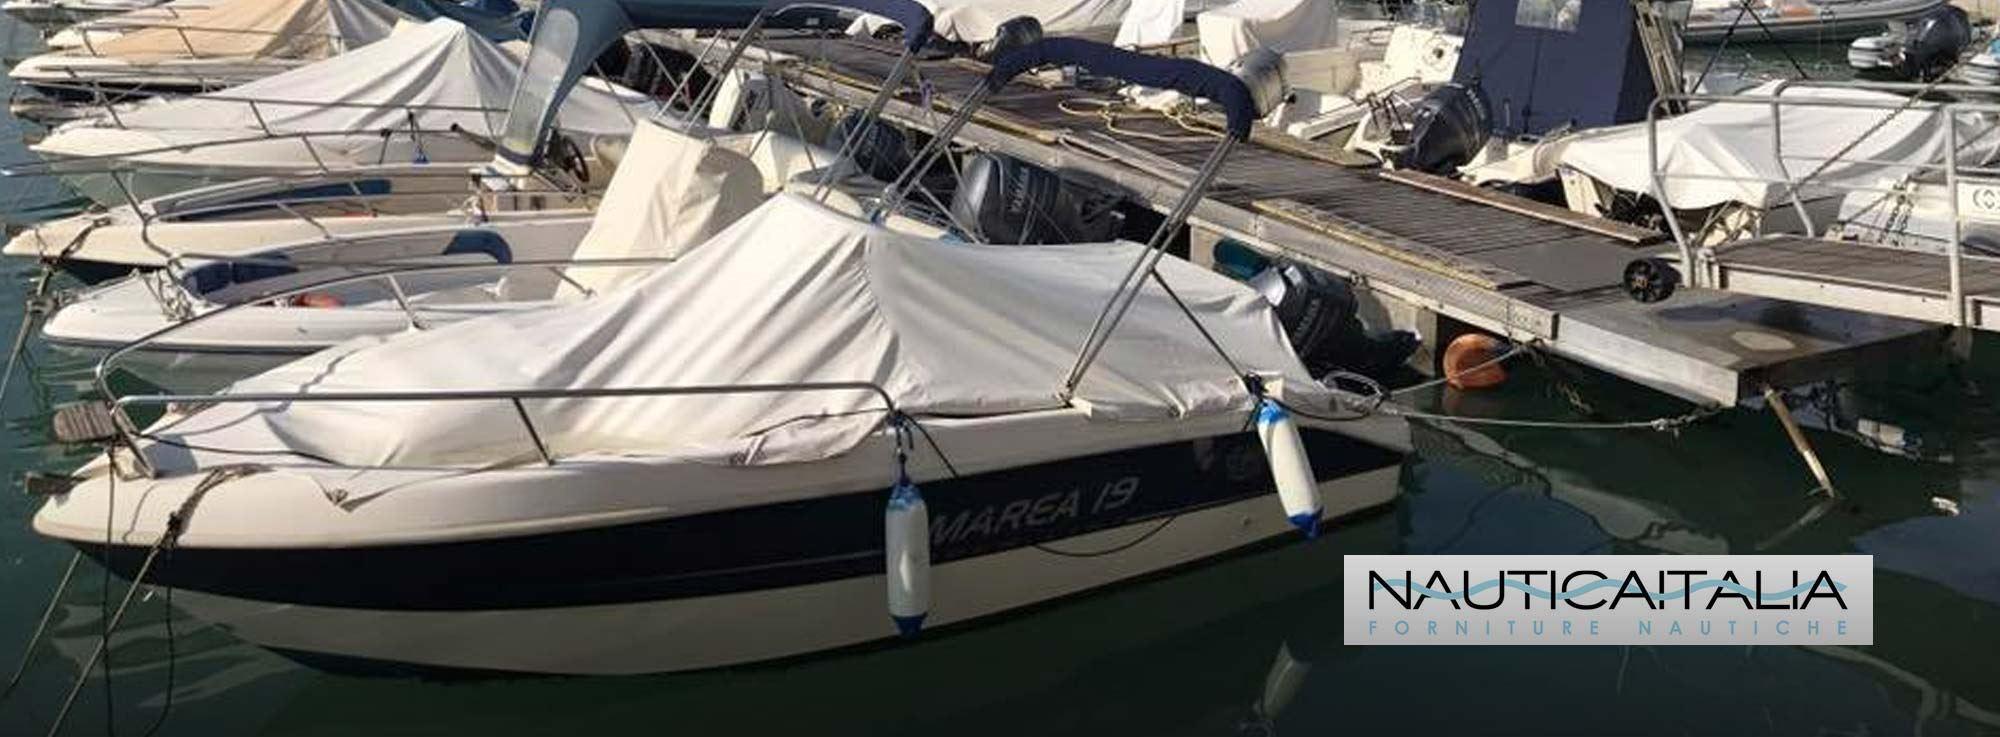 Nautica Italia Trani